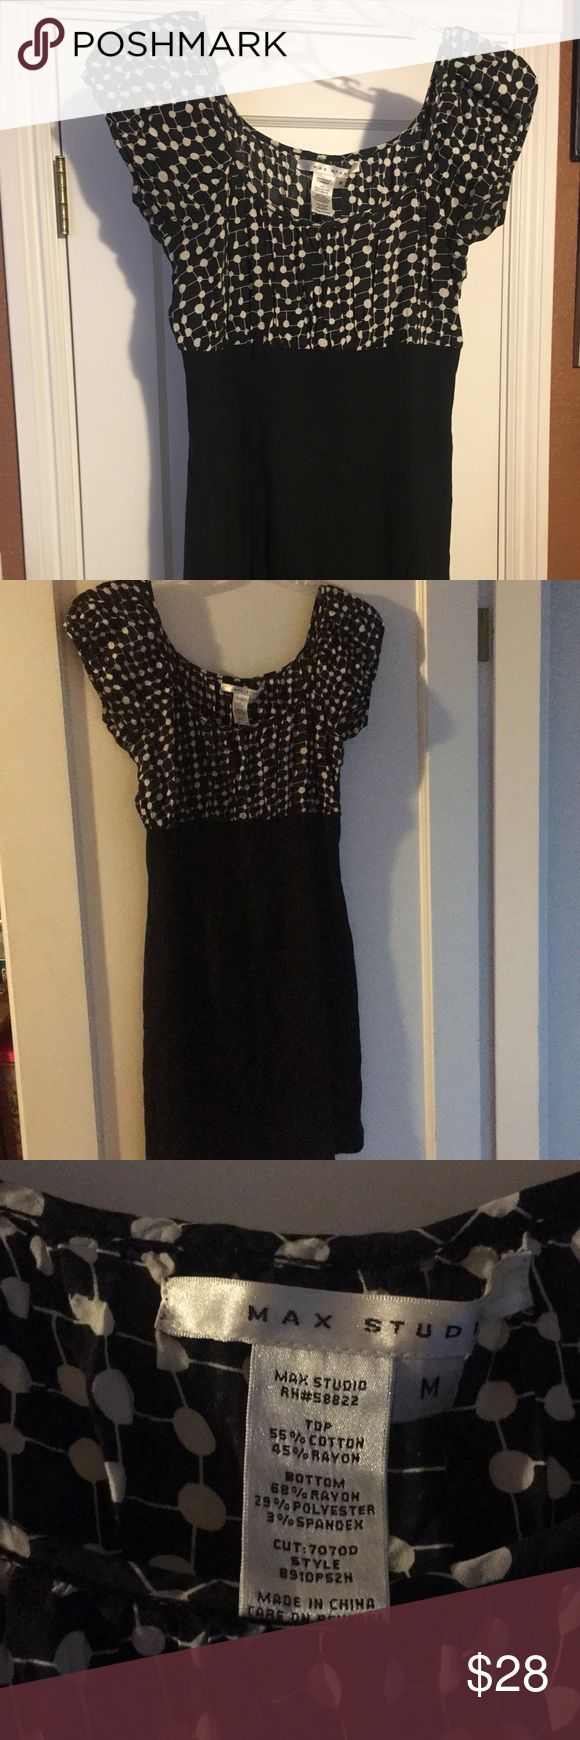 Casual work dress Black and white polka dot dress Max Studio Dresses Midi